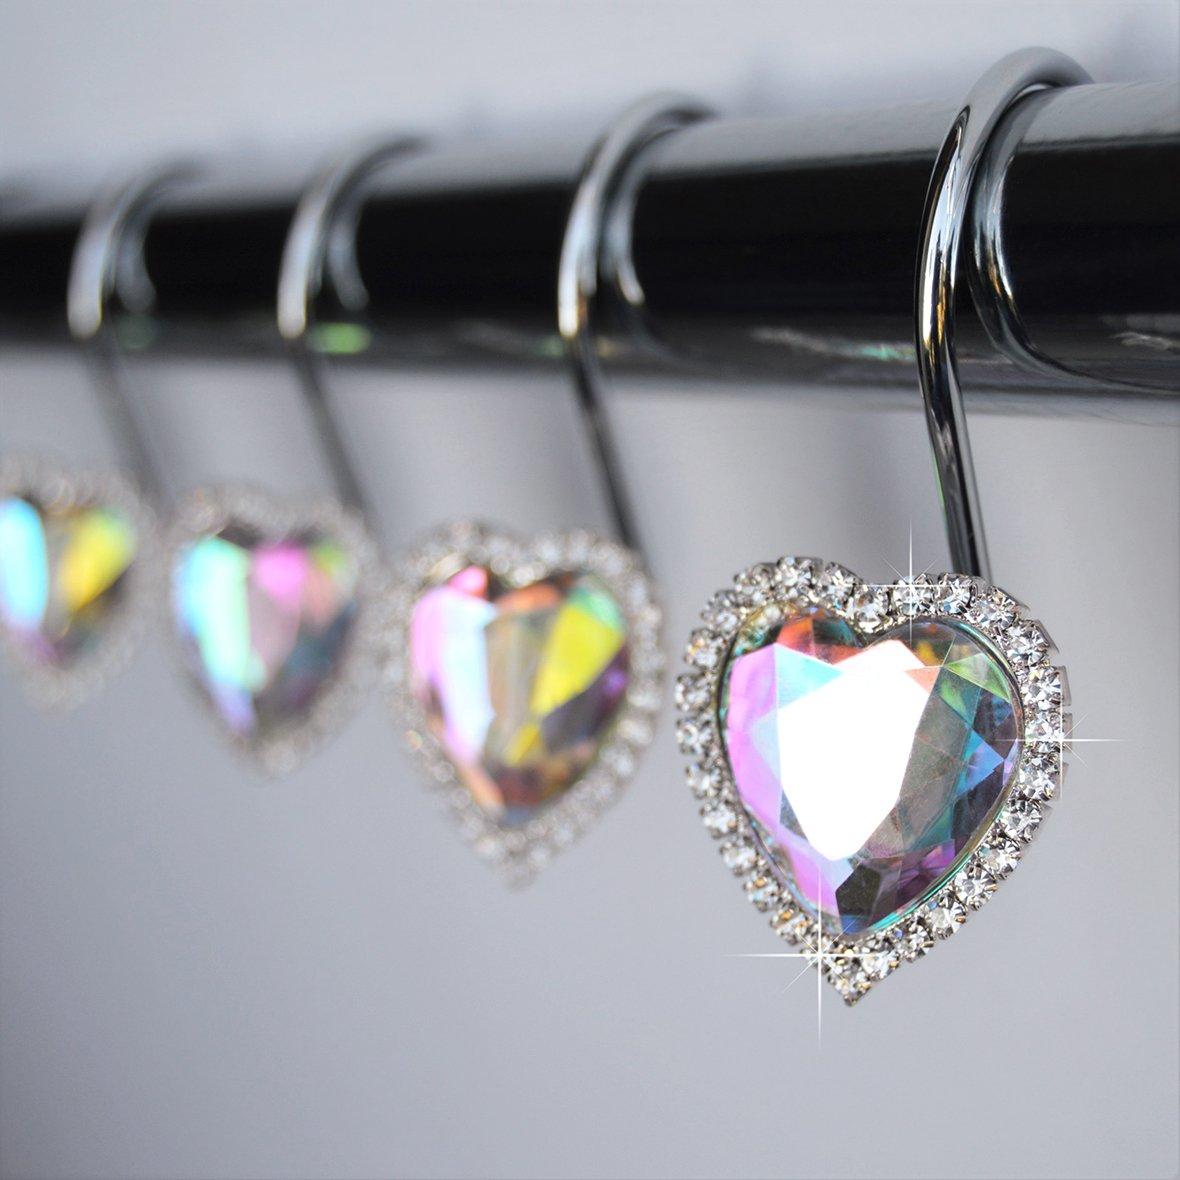 American Cuteness Shower Curtain Hooks Rings - Heart Multi Color Vintage Look Iridescent Rainbow Diamond Decorative Crystal Bling Rhinestones Bathroom Bath Set Gift Valentine Girl (Multi Color)